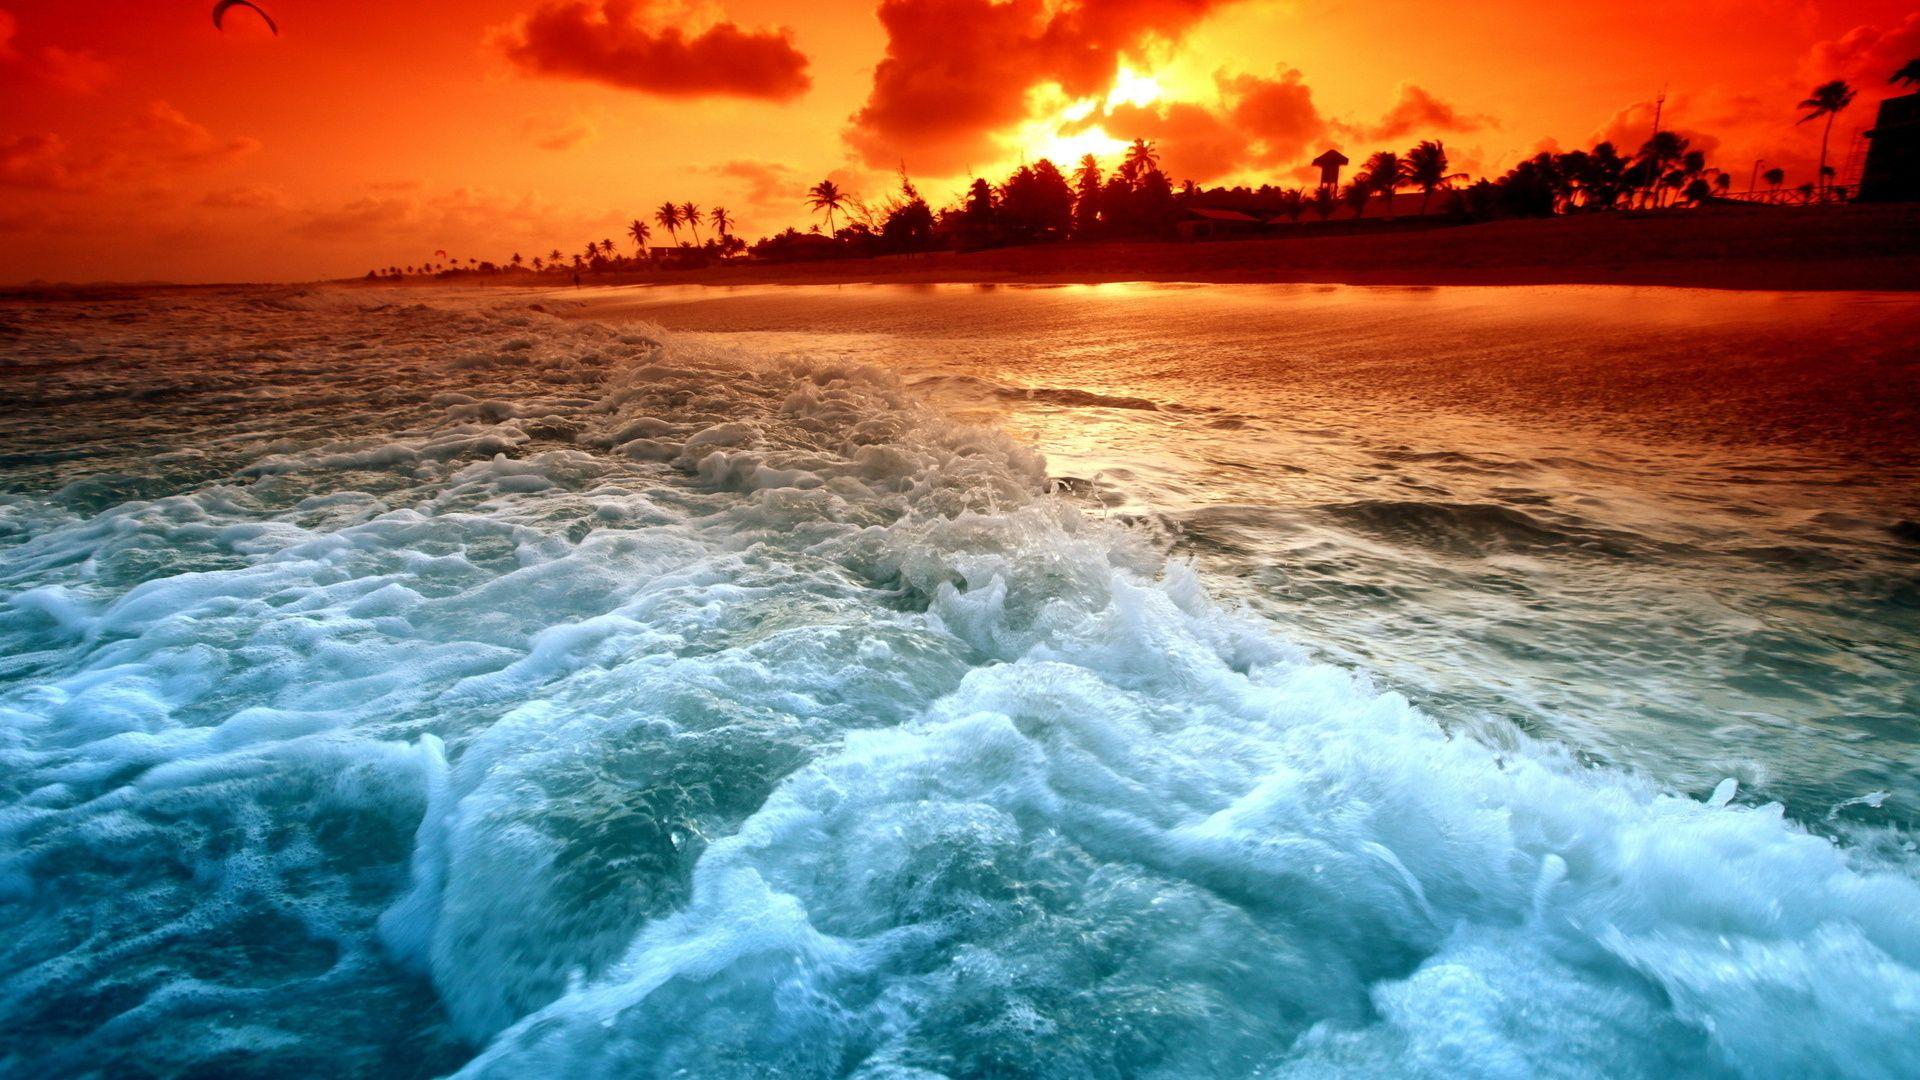 Ocean Themed full screen hd wallpaper